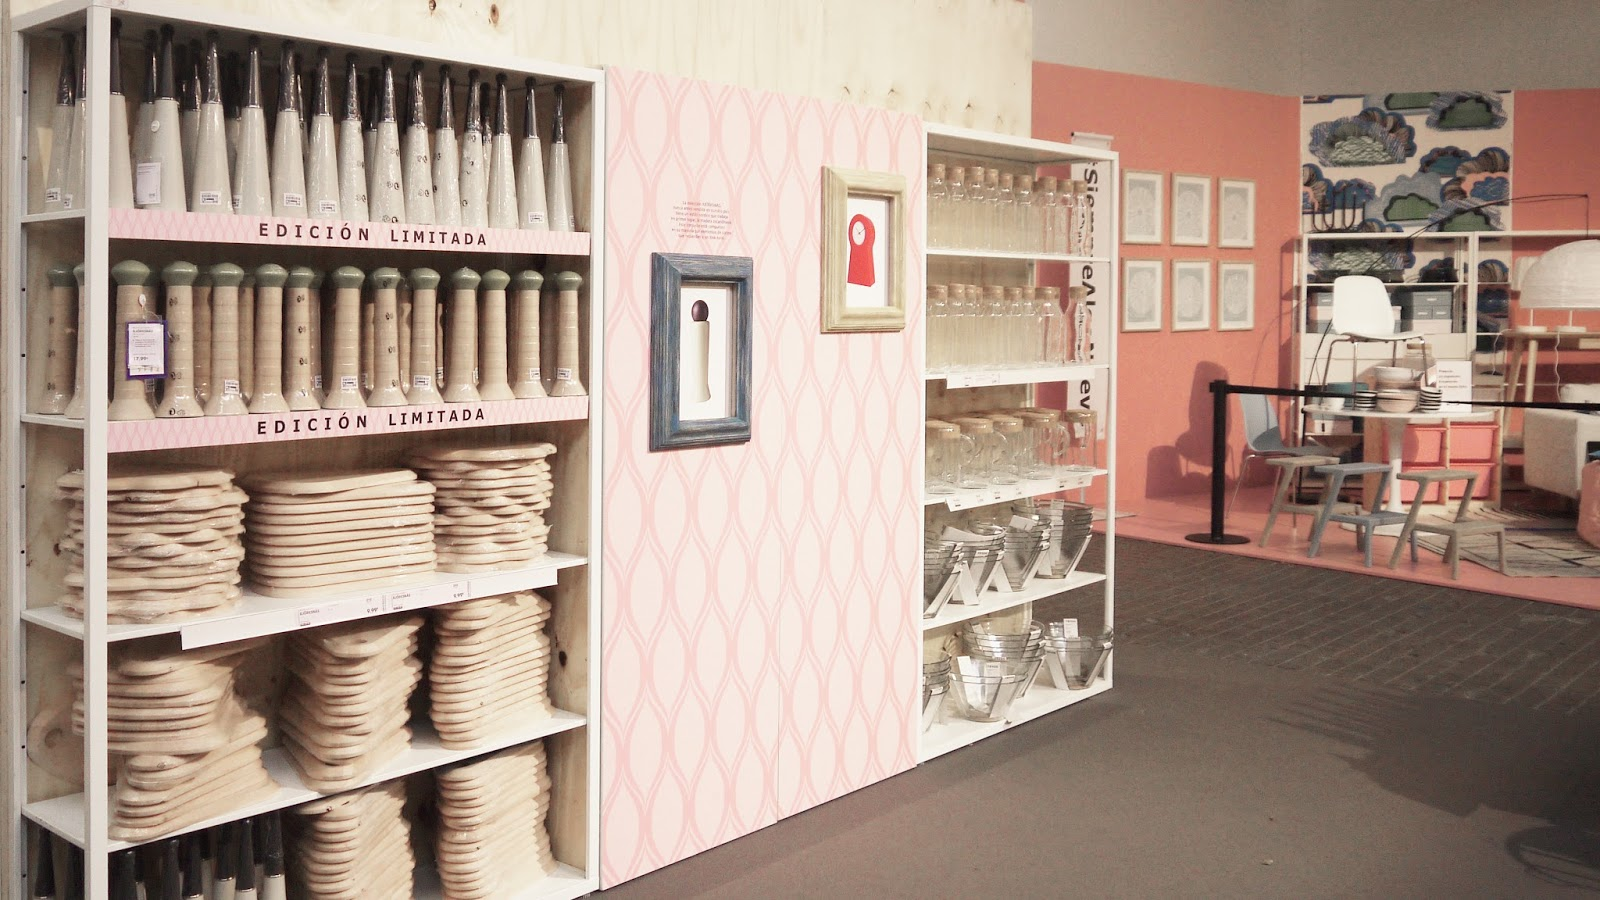 Mi armario coqueto tour tiendita ikea organizador de - Organizadores de armarios ikea ...